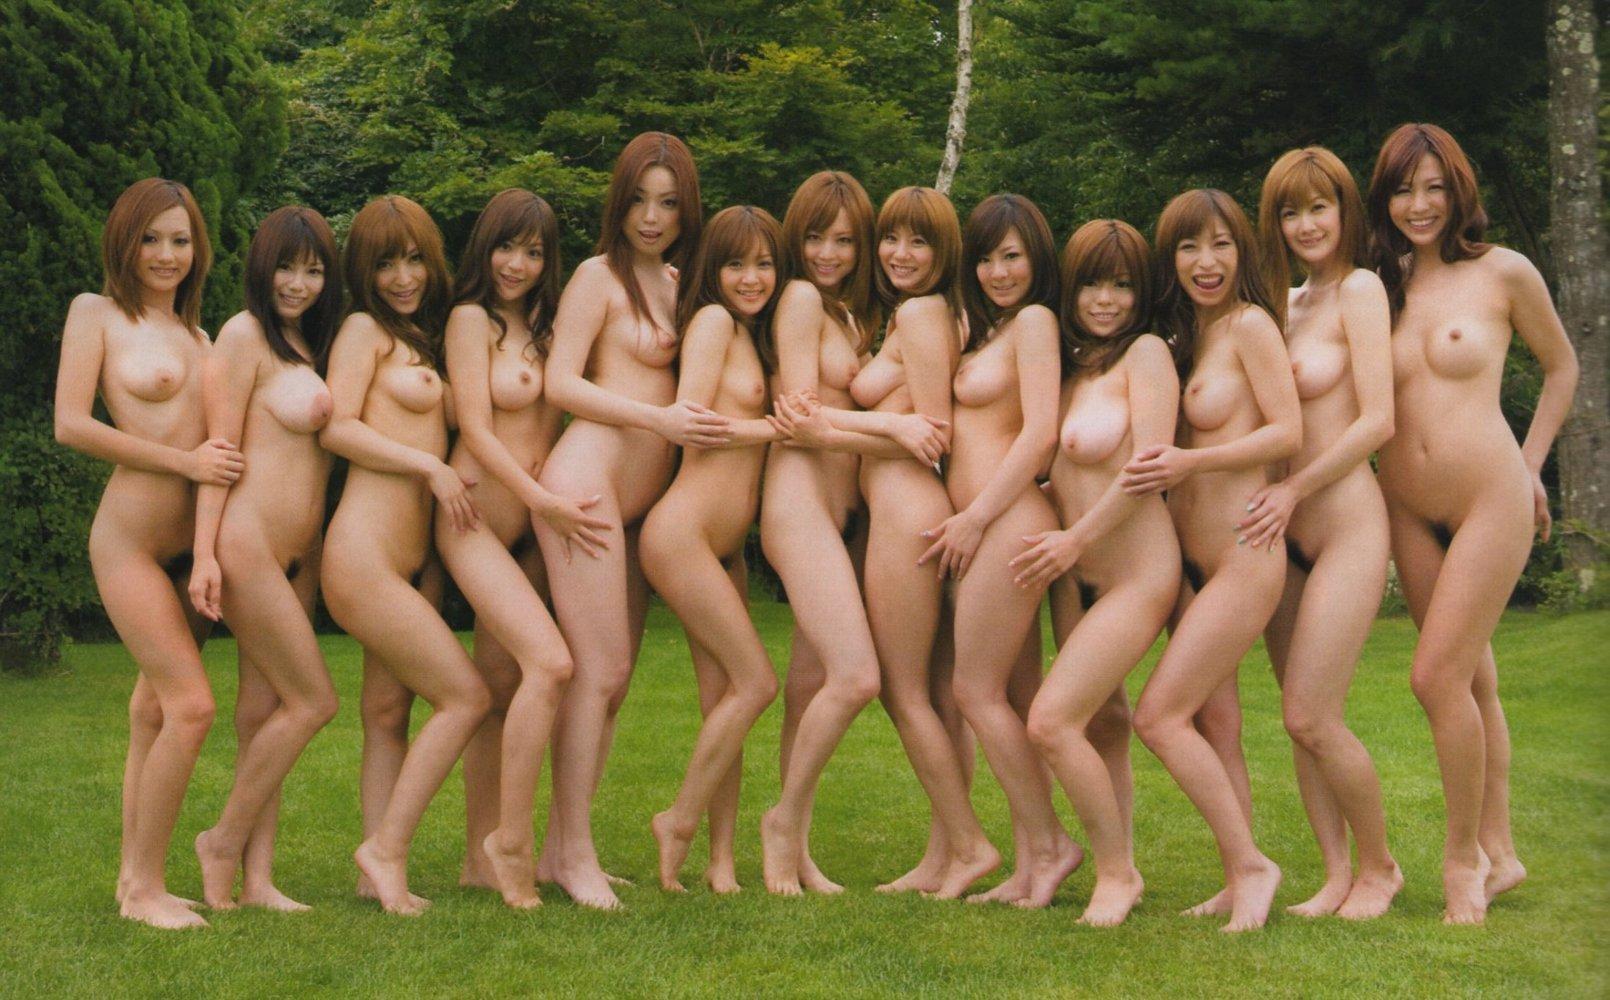 японский инцест с дочками найдено более 1000 порно видео